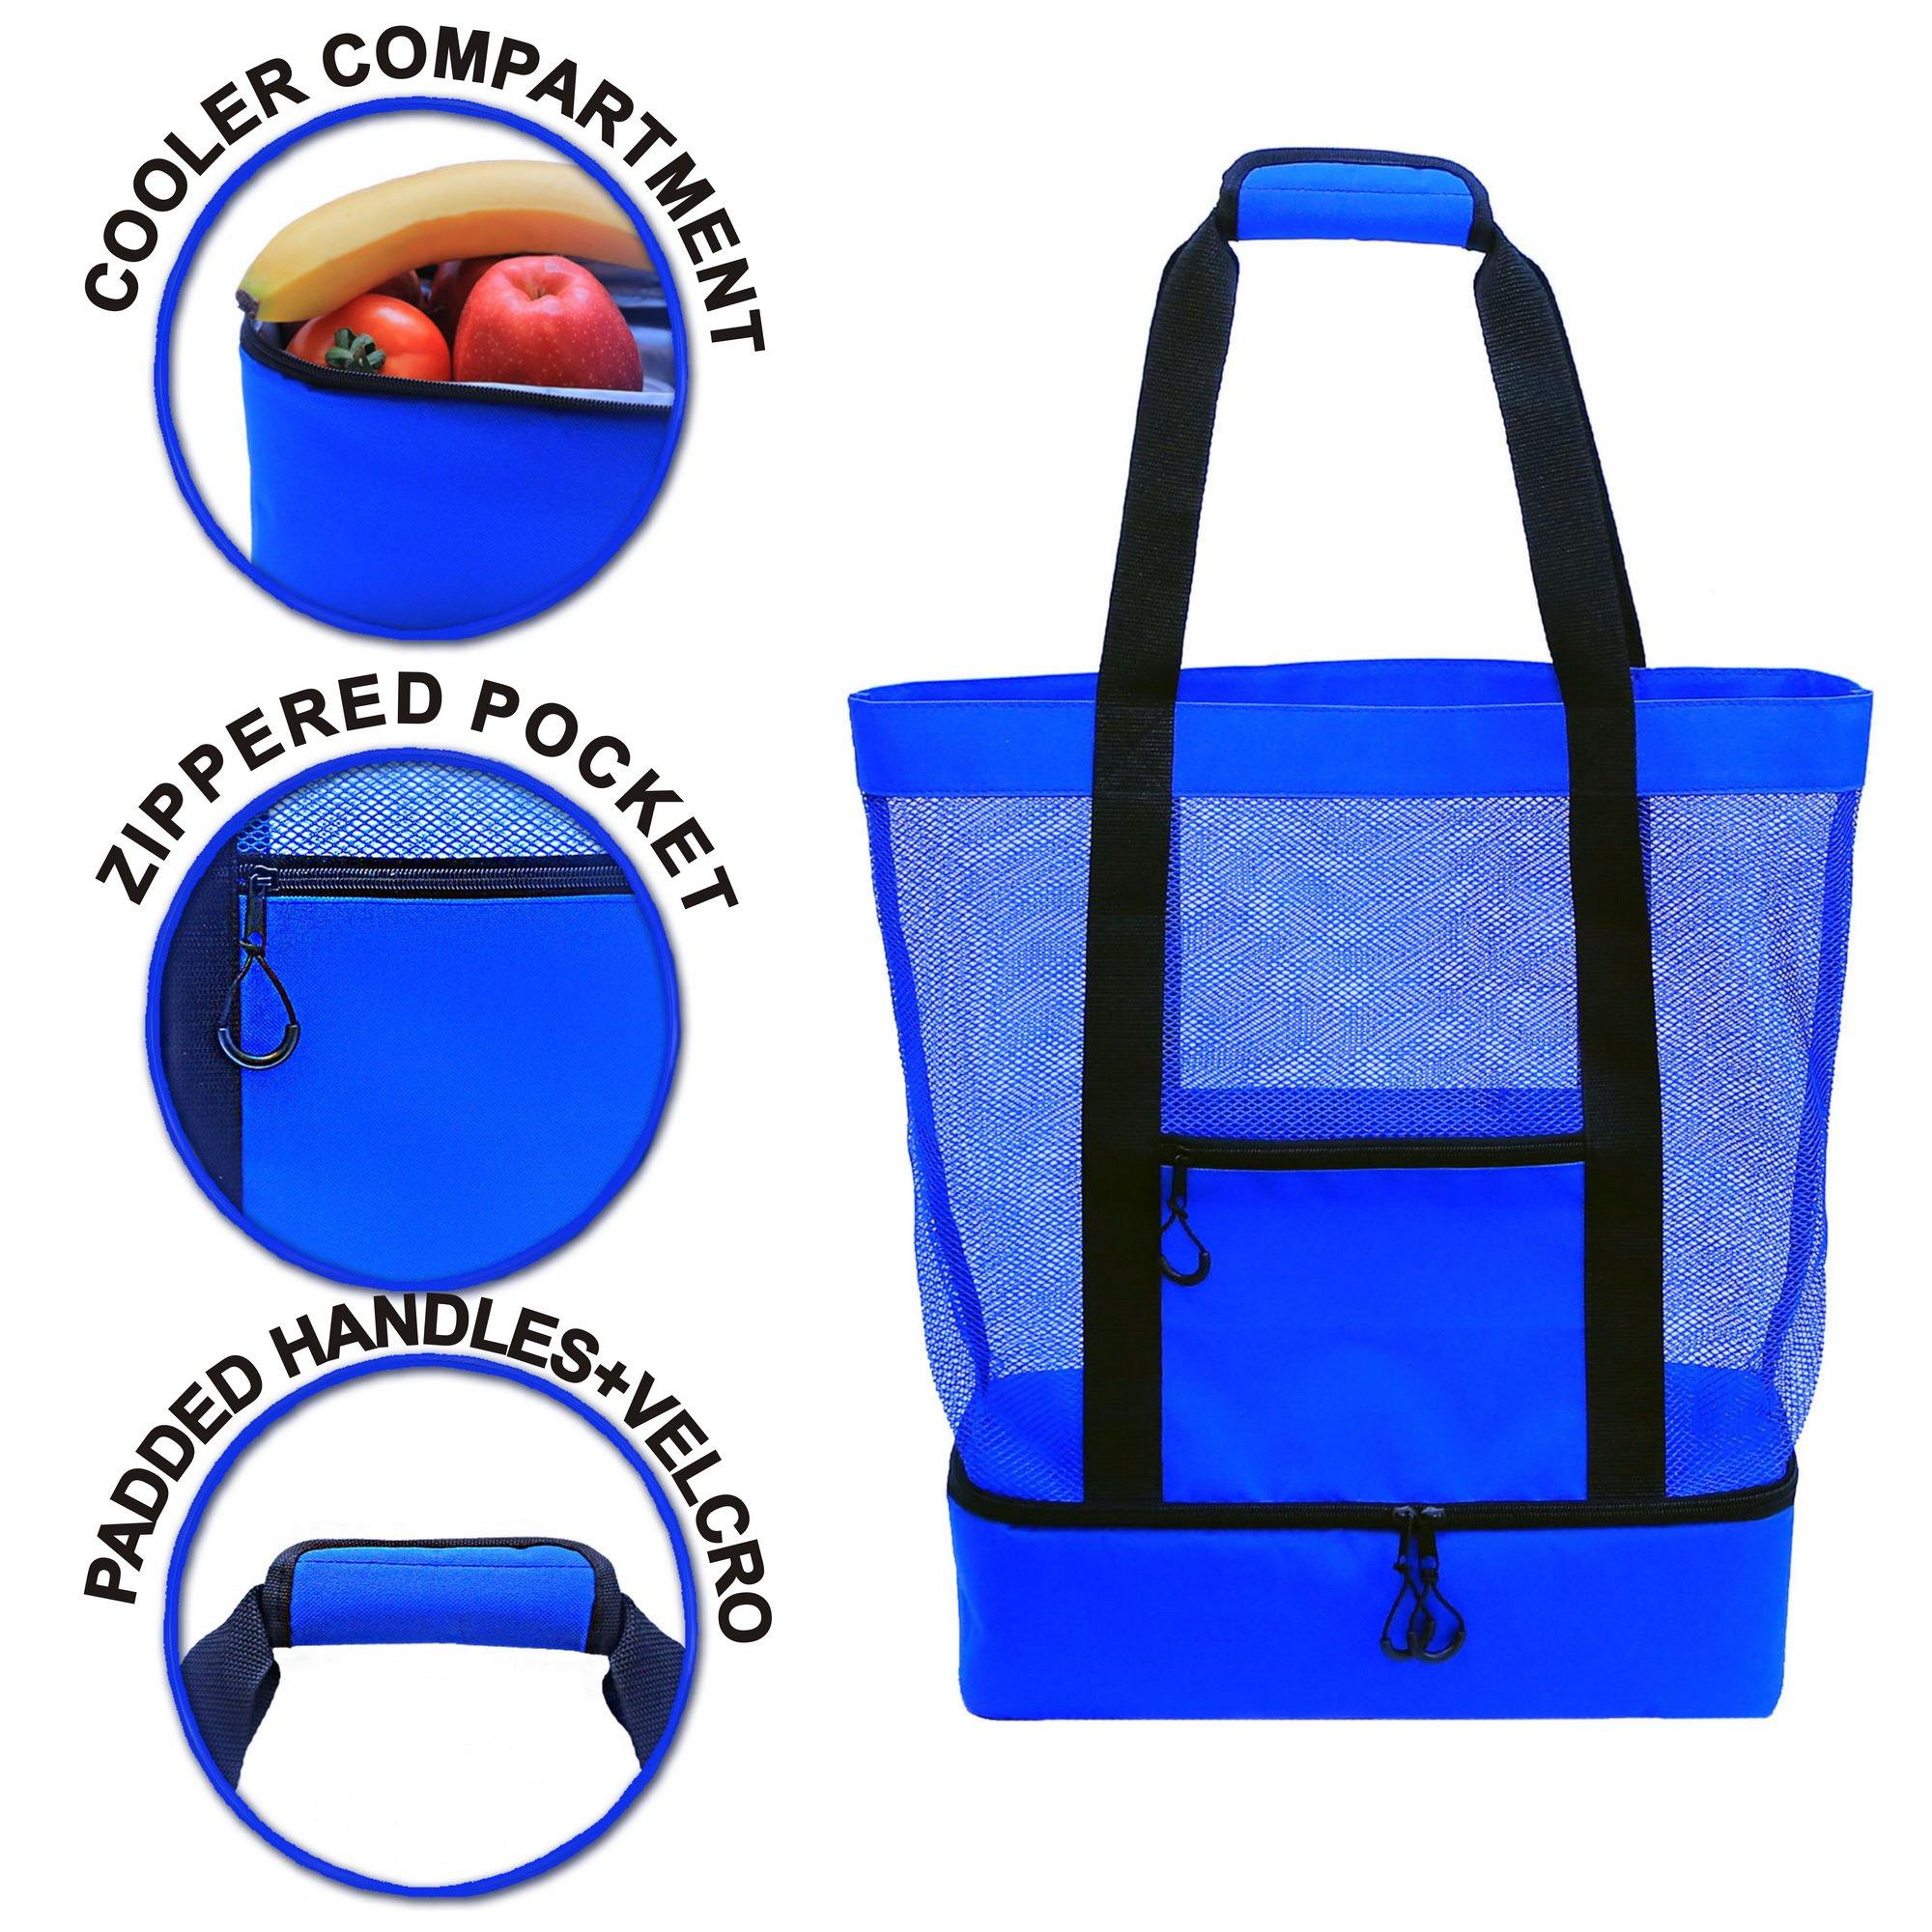 JU&JI's Beach Tote Bags – 2-in-1 Design – Mesh Bag & Built-in Picnic Cooler Compartment – Big or Extra Large Cooler Beach Bags – Padded Handle, Waterproof Zipper & Heavy-Duty Build by Ju&Ji (Image #3)